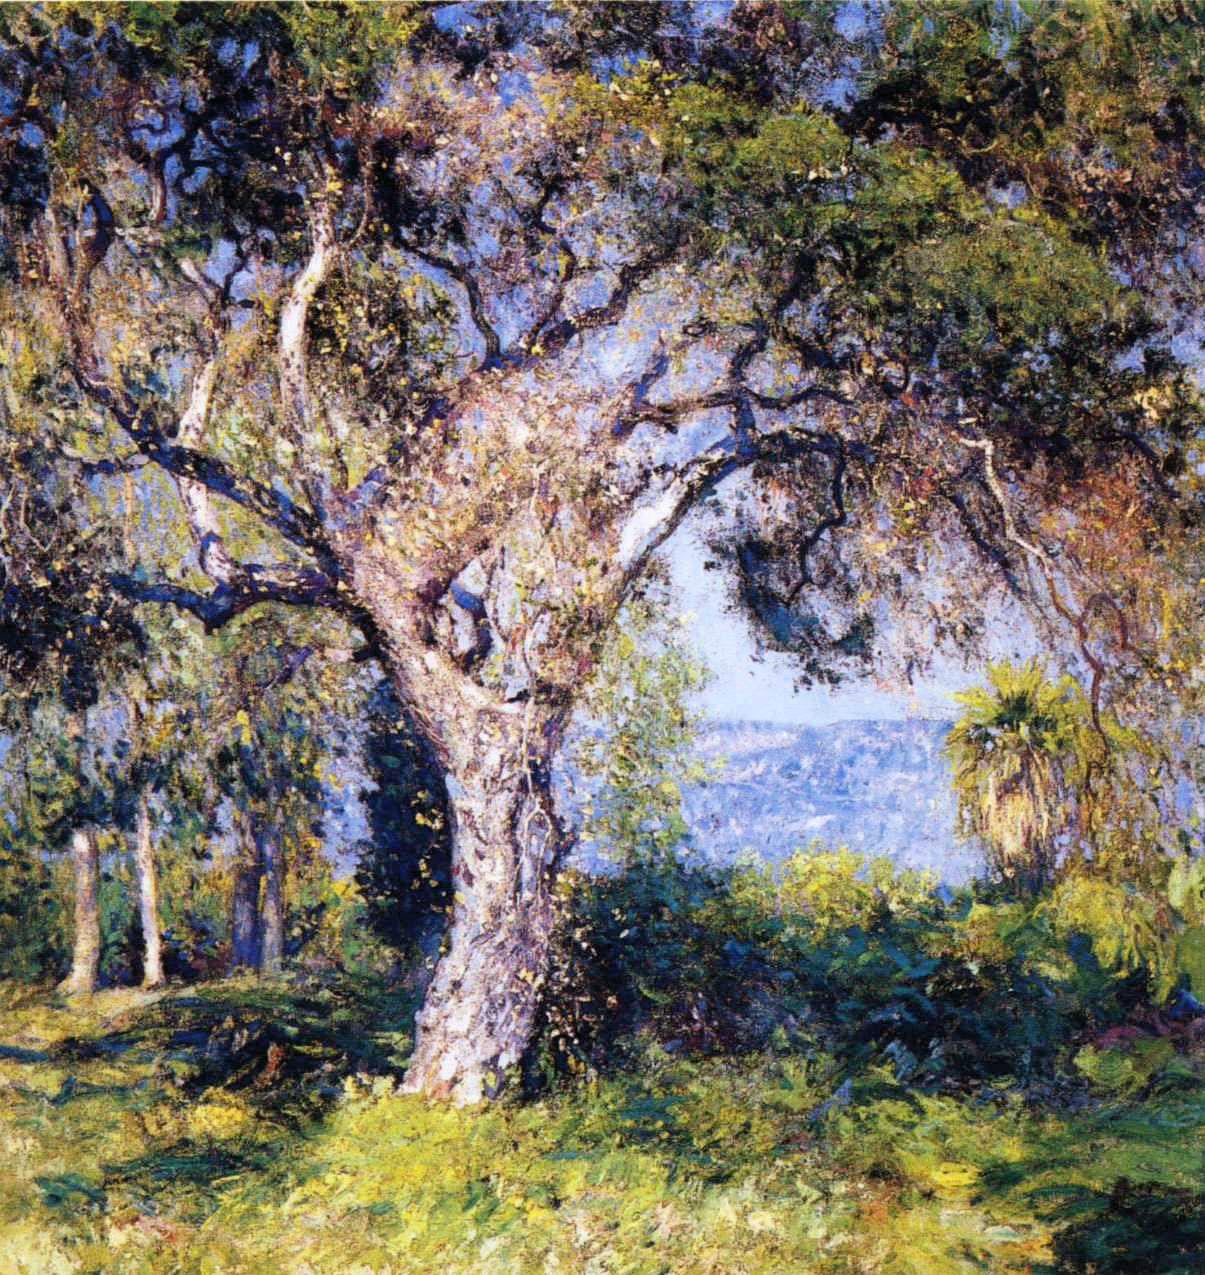 bofransson: Guy Orlando Rose - The Oak | pintura | Pinterest | Pinturas